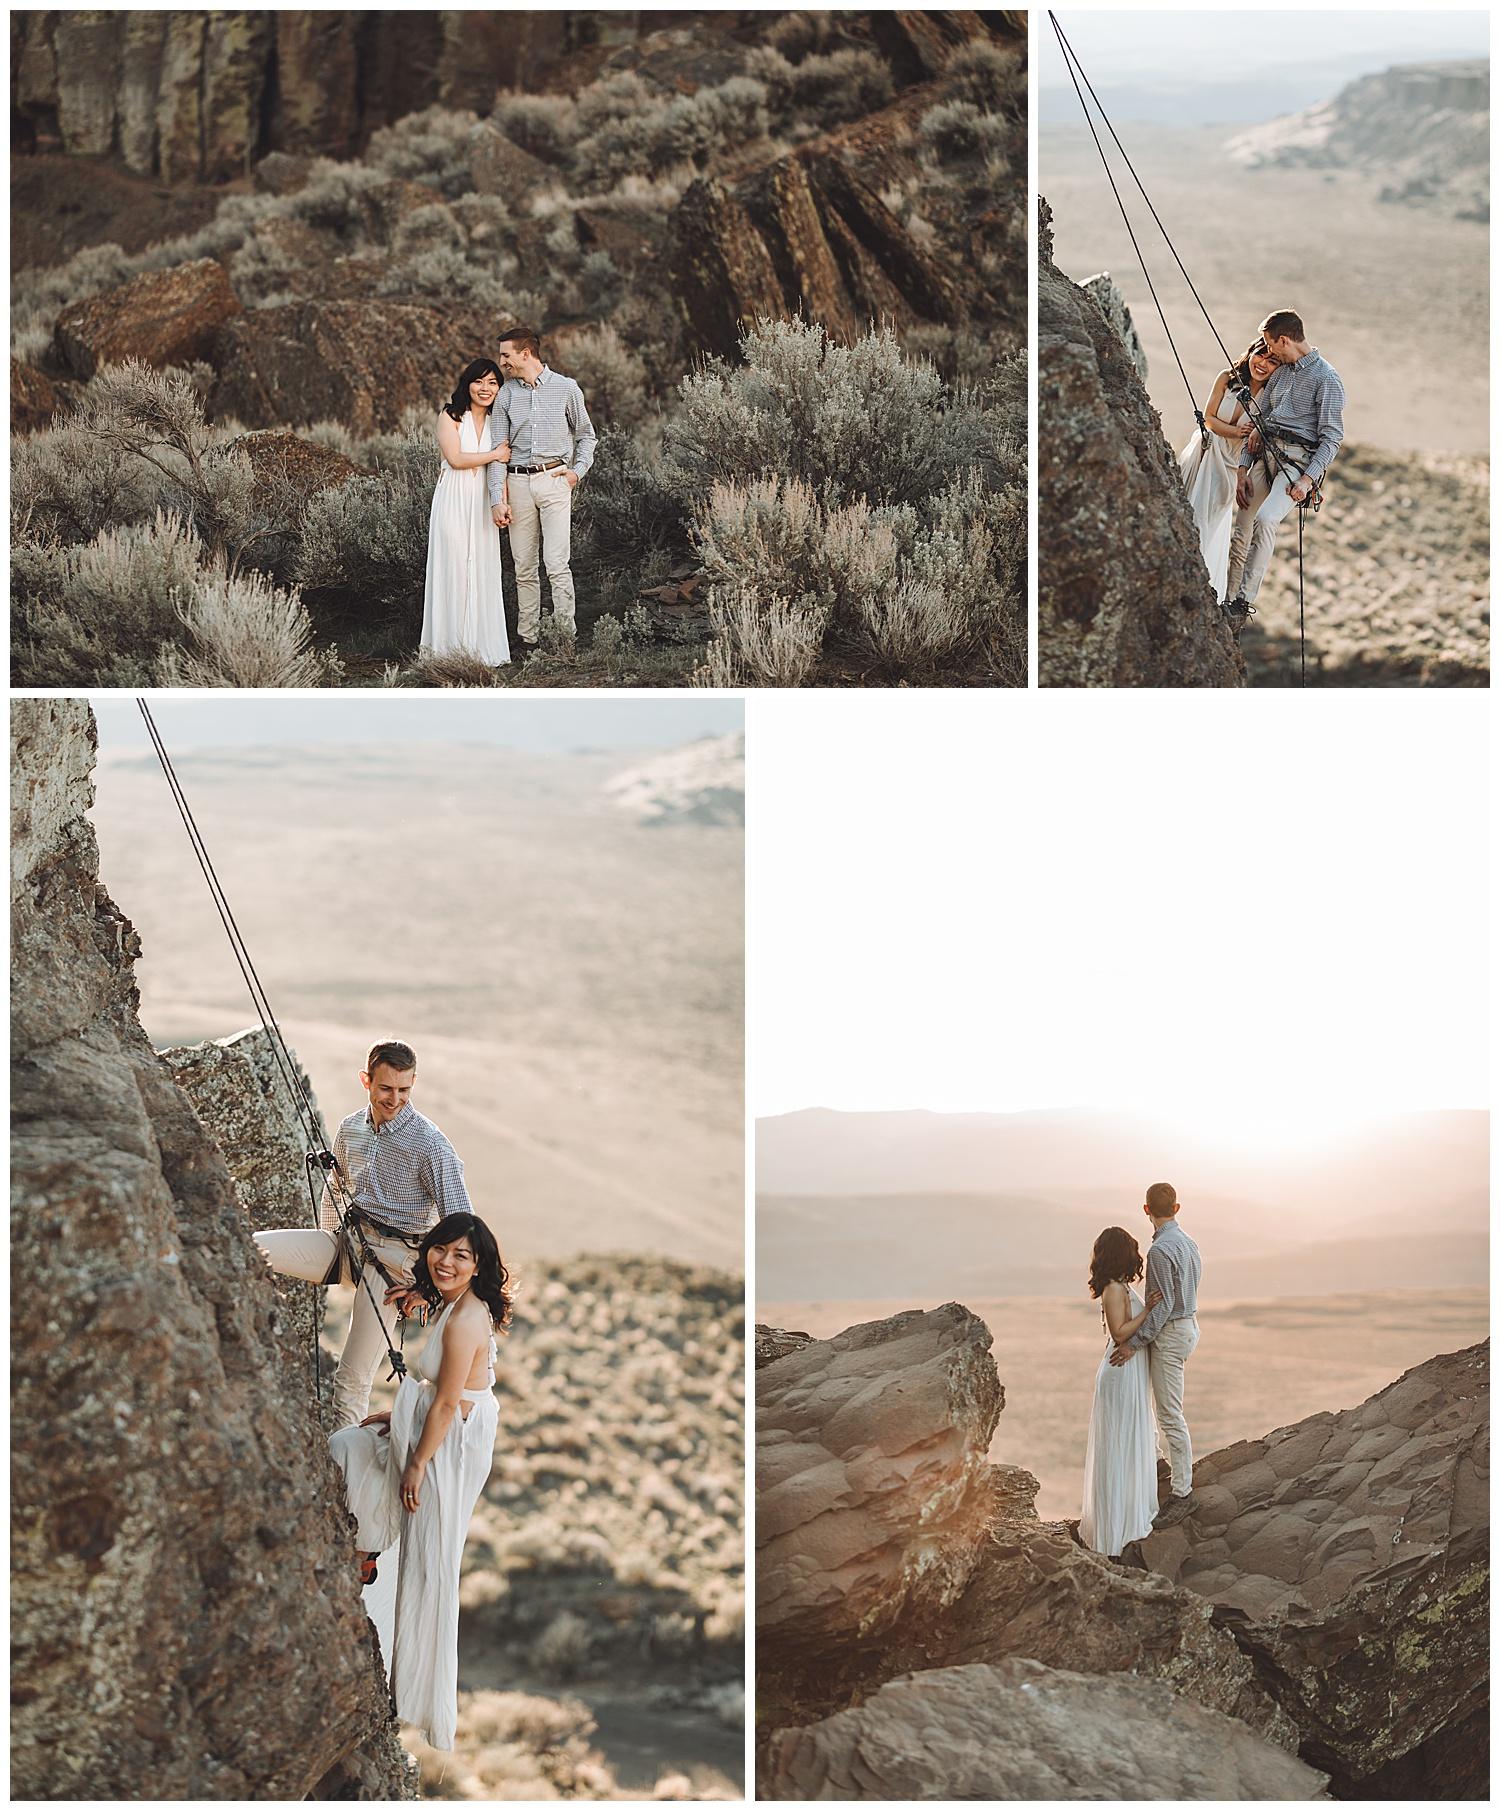 Rock-climbing-engagement-photo-shoot_Stephanie-Keegan-Photography_04.jpg